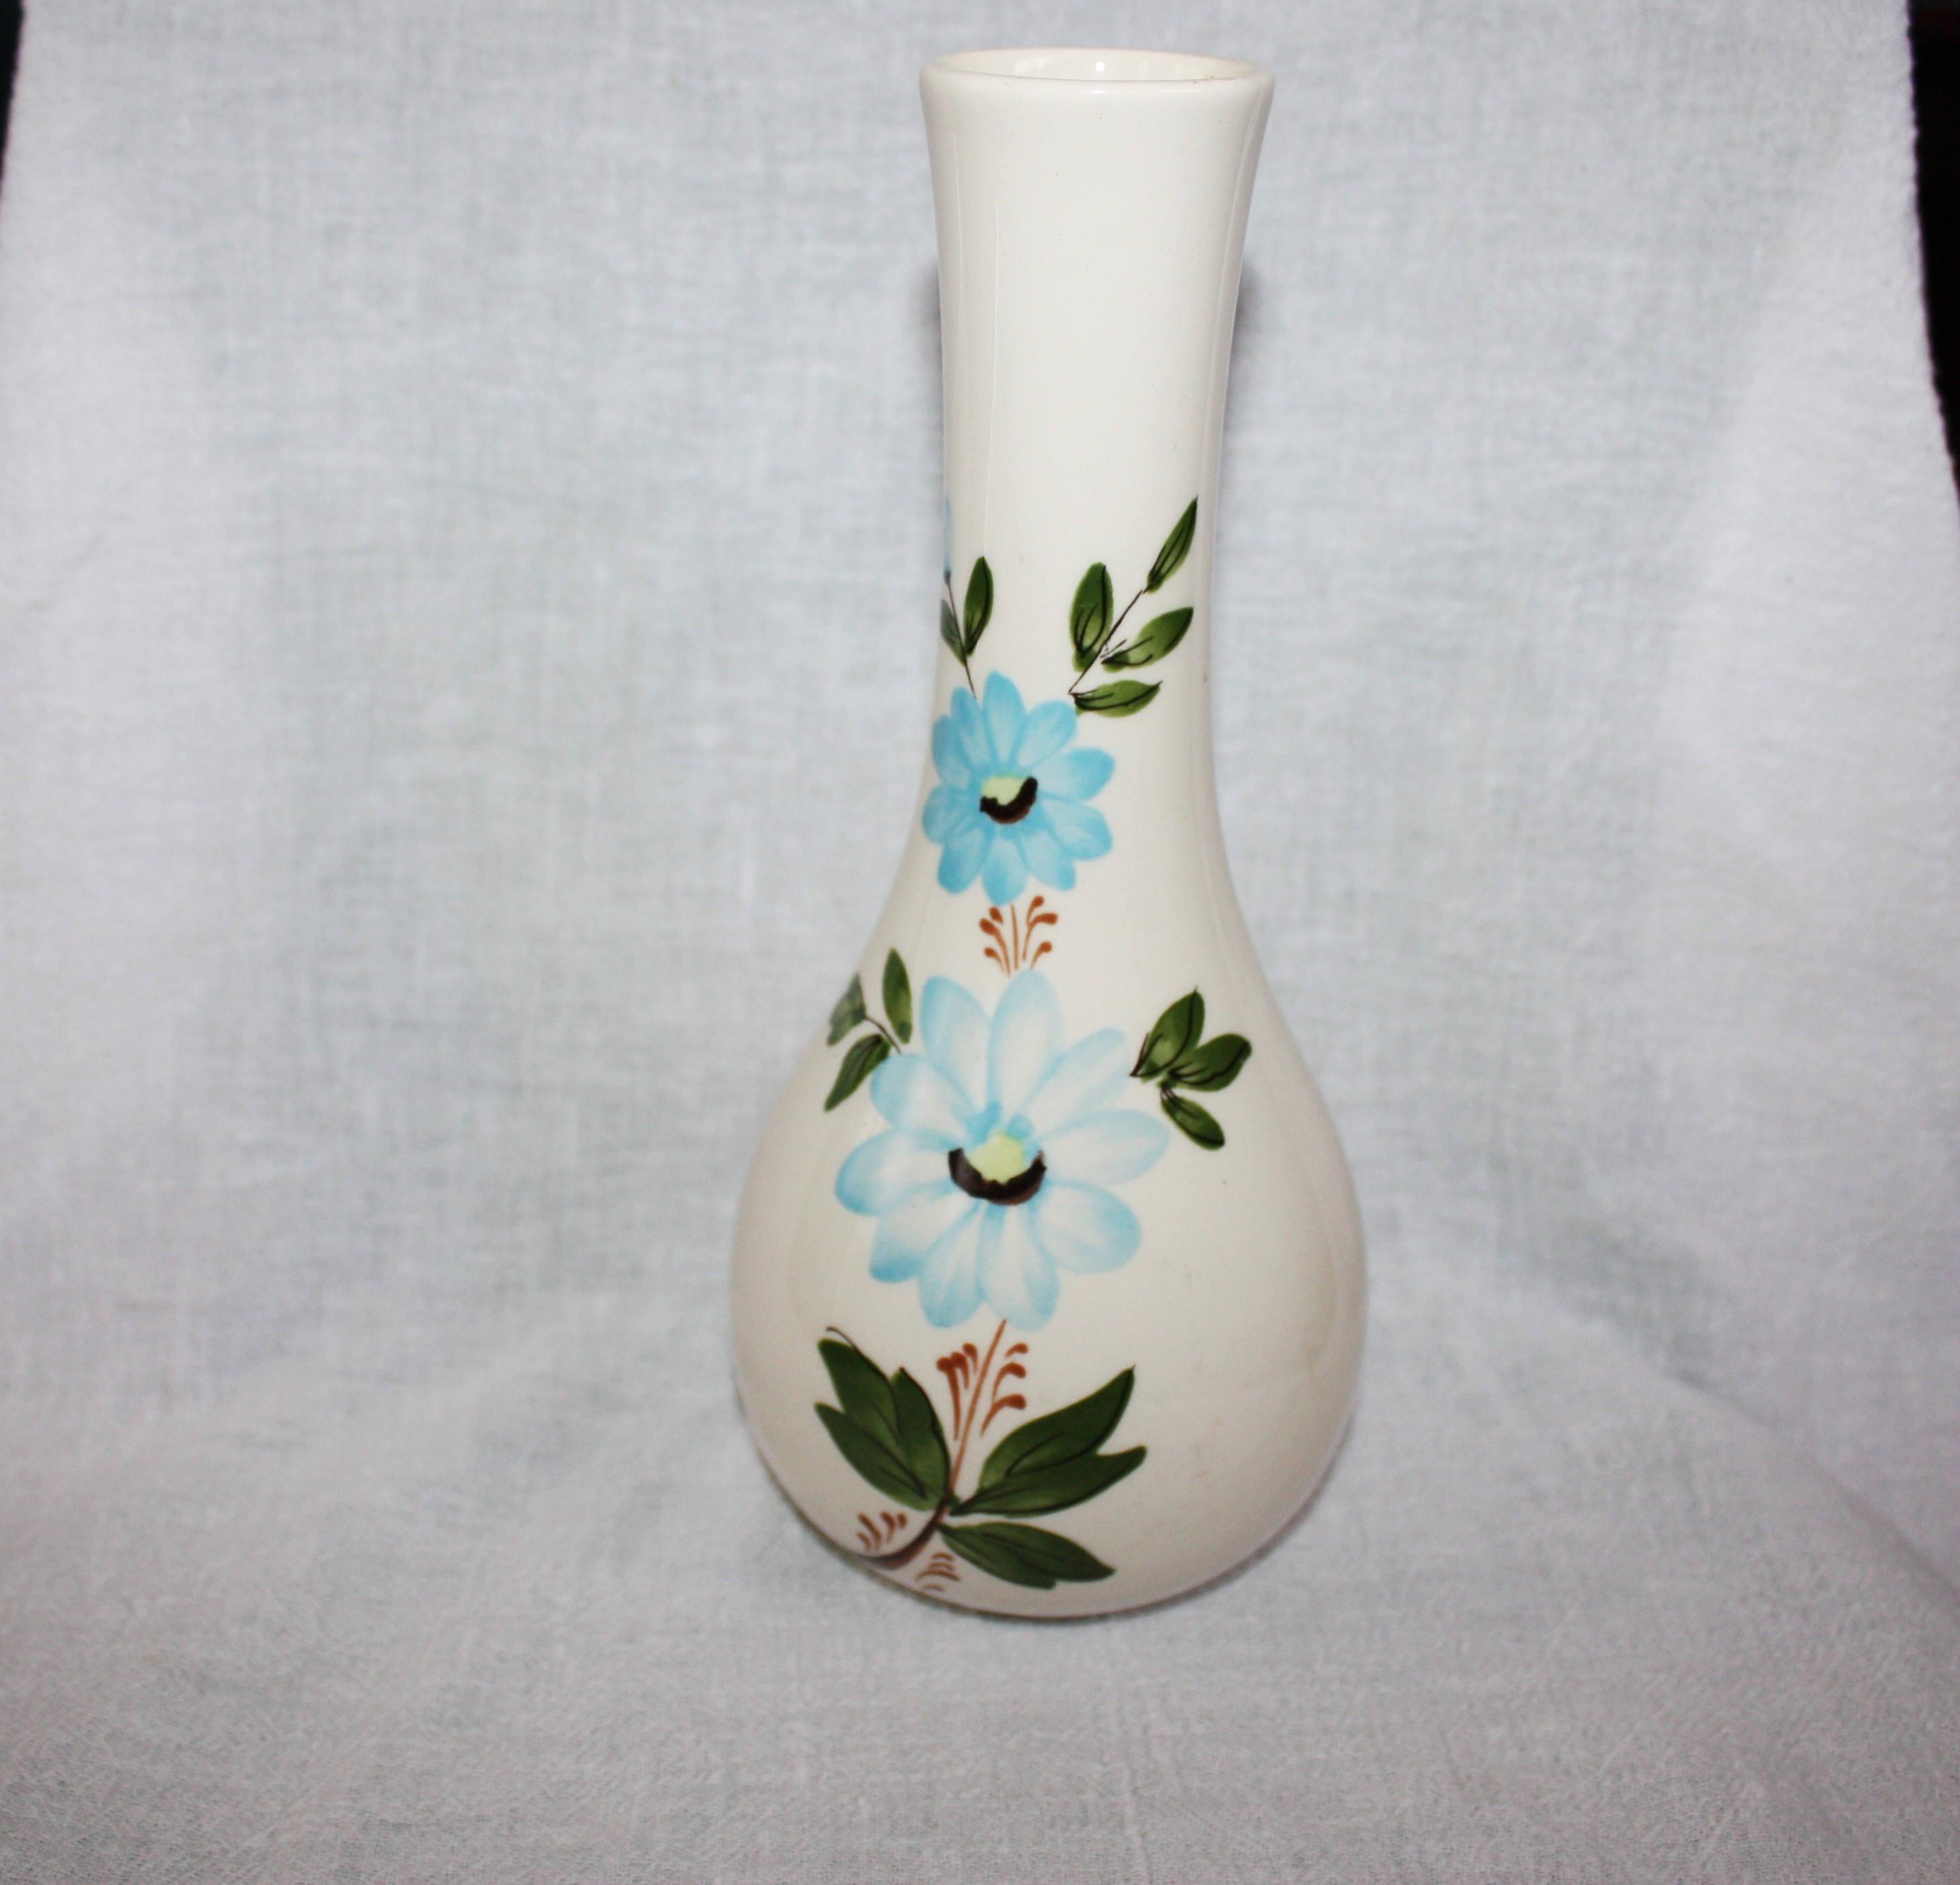 heart shaped glass vase of vintage 1979 sado portugal vase for ftda blue flowers etsy with regard to image 0